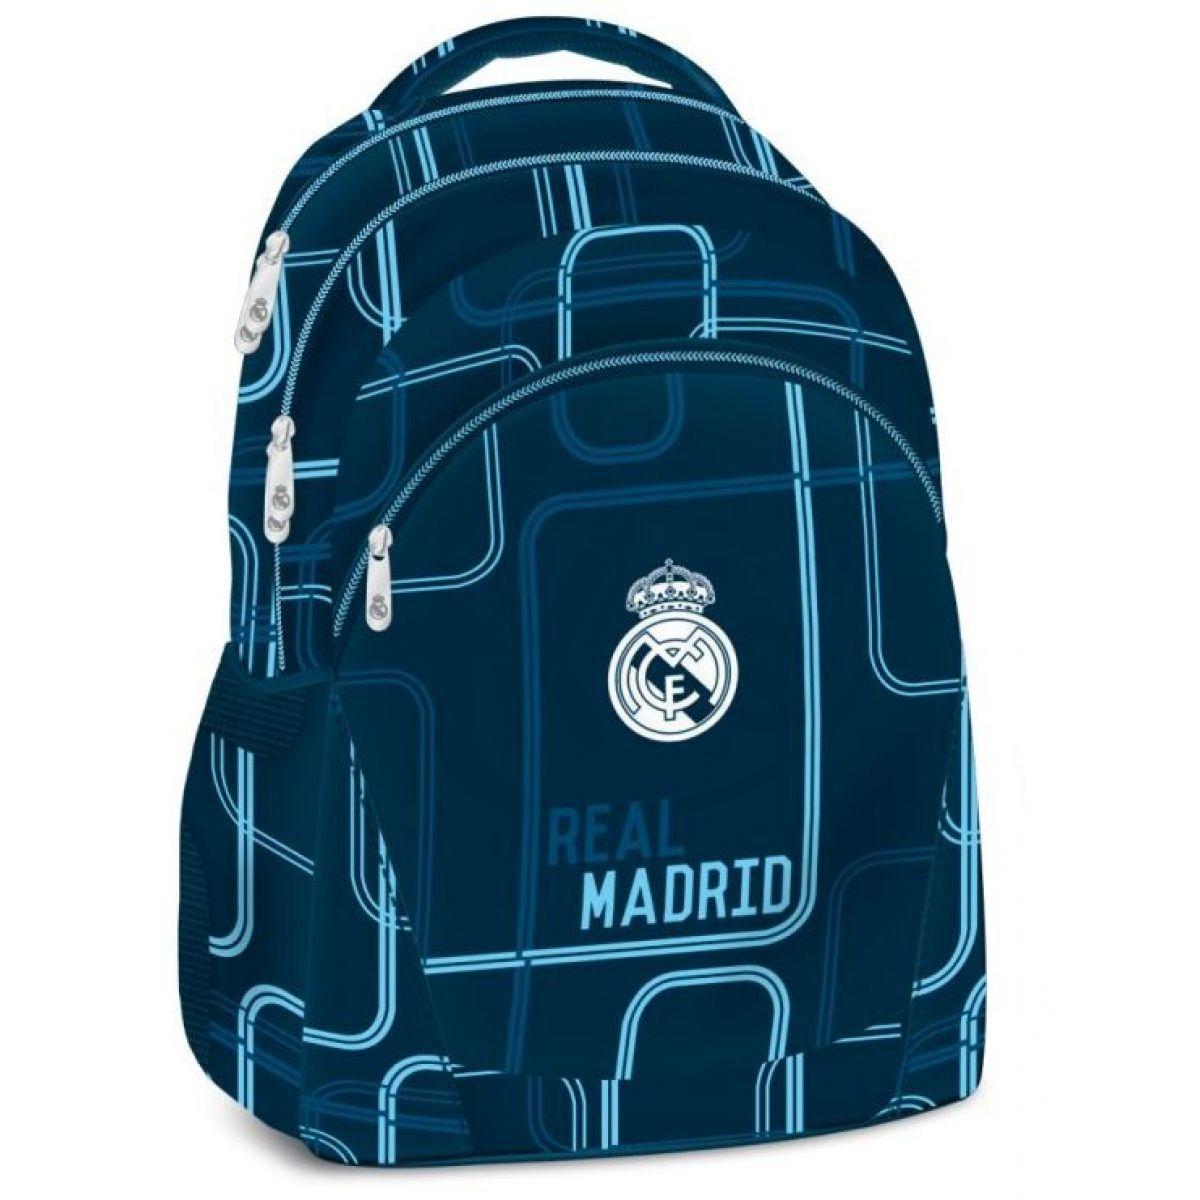 b1161079f67 Ars Una Školní batoh Real Madrid 2017 3 komory